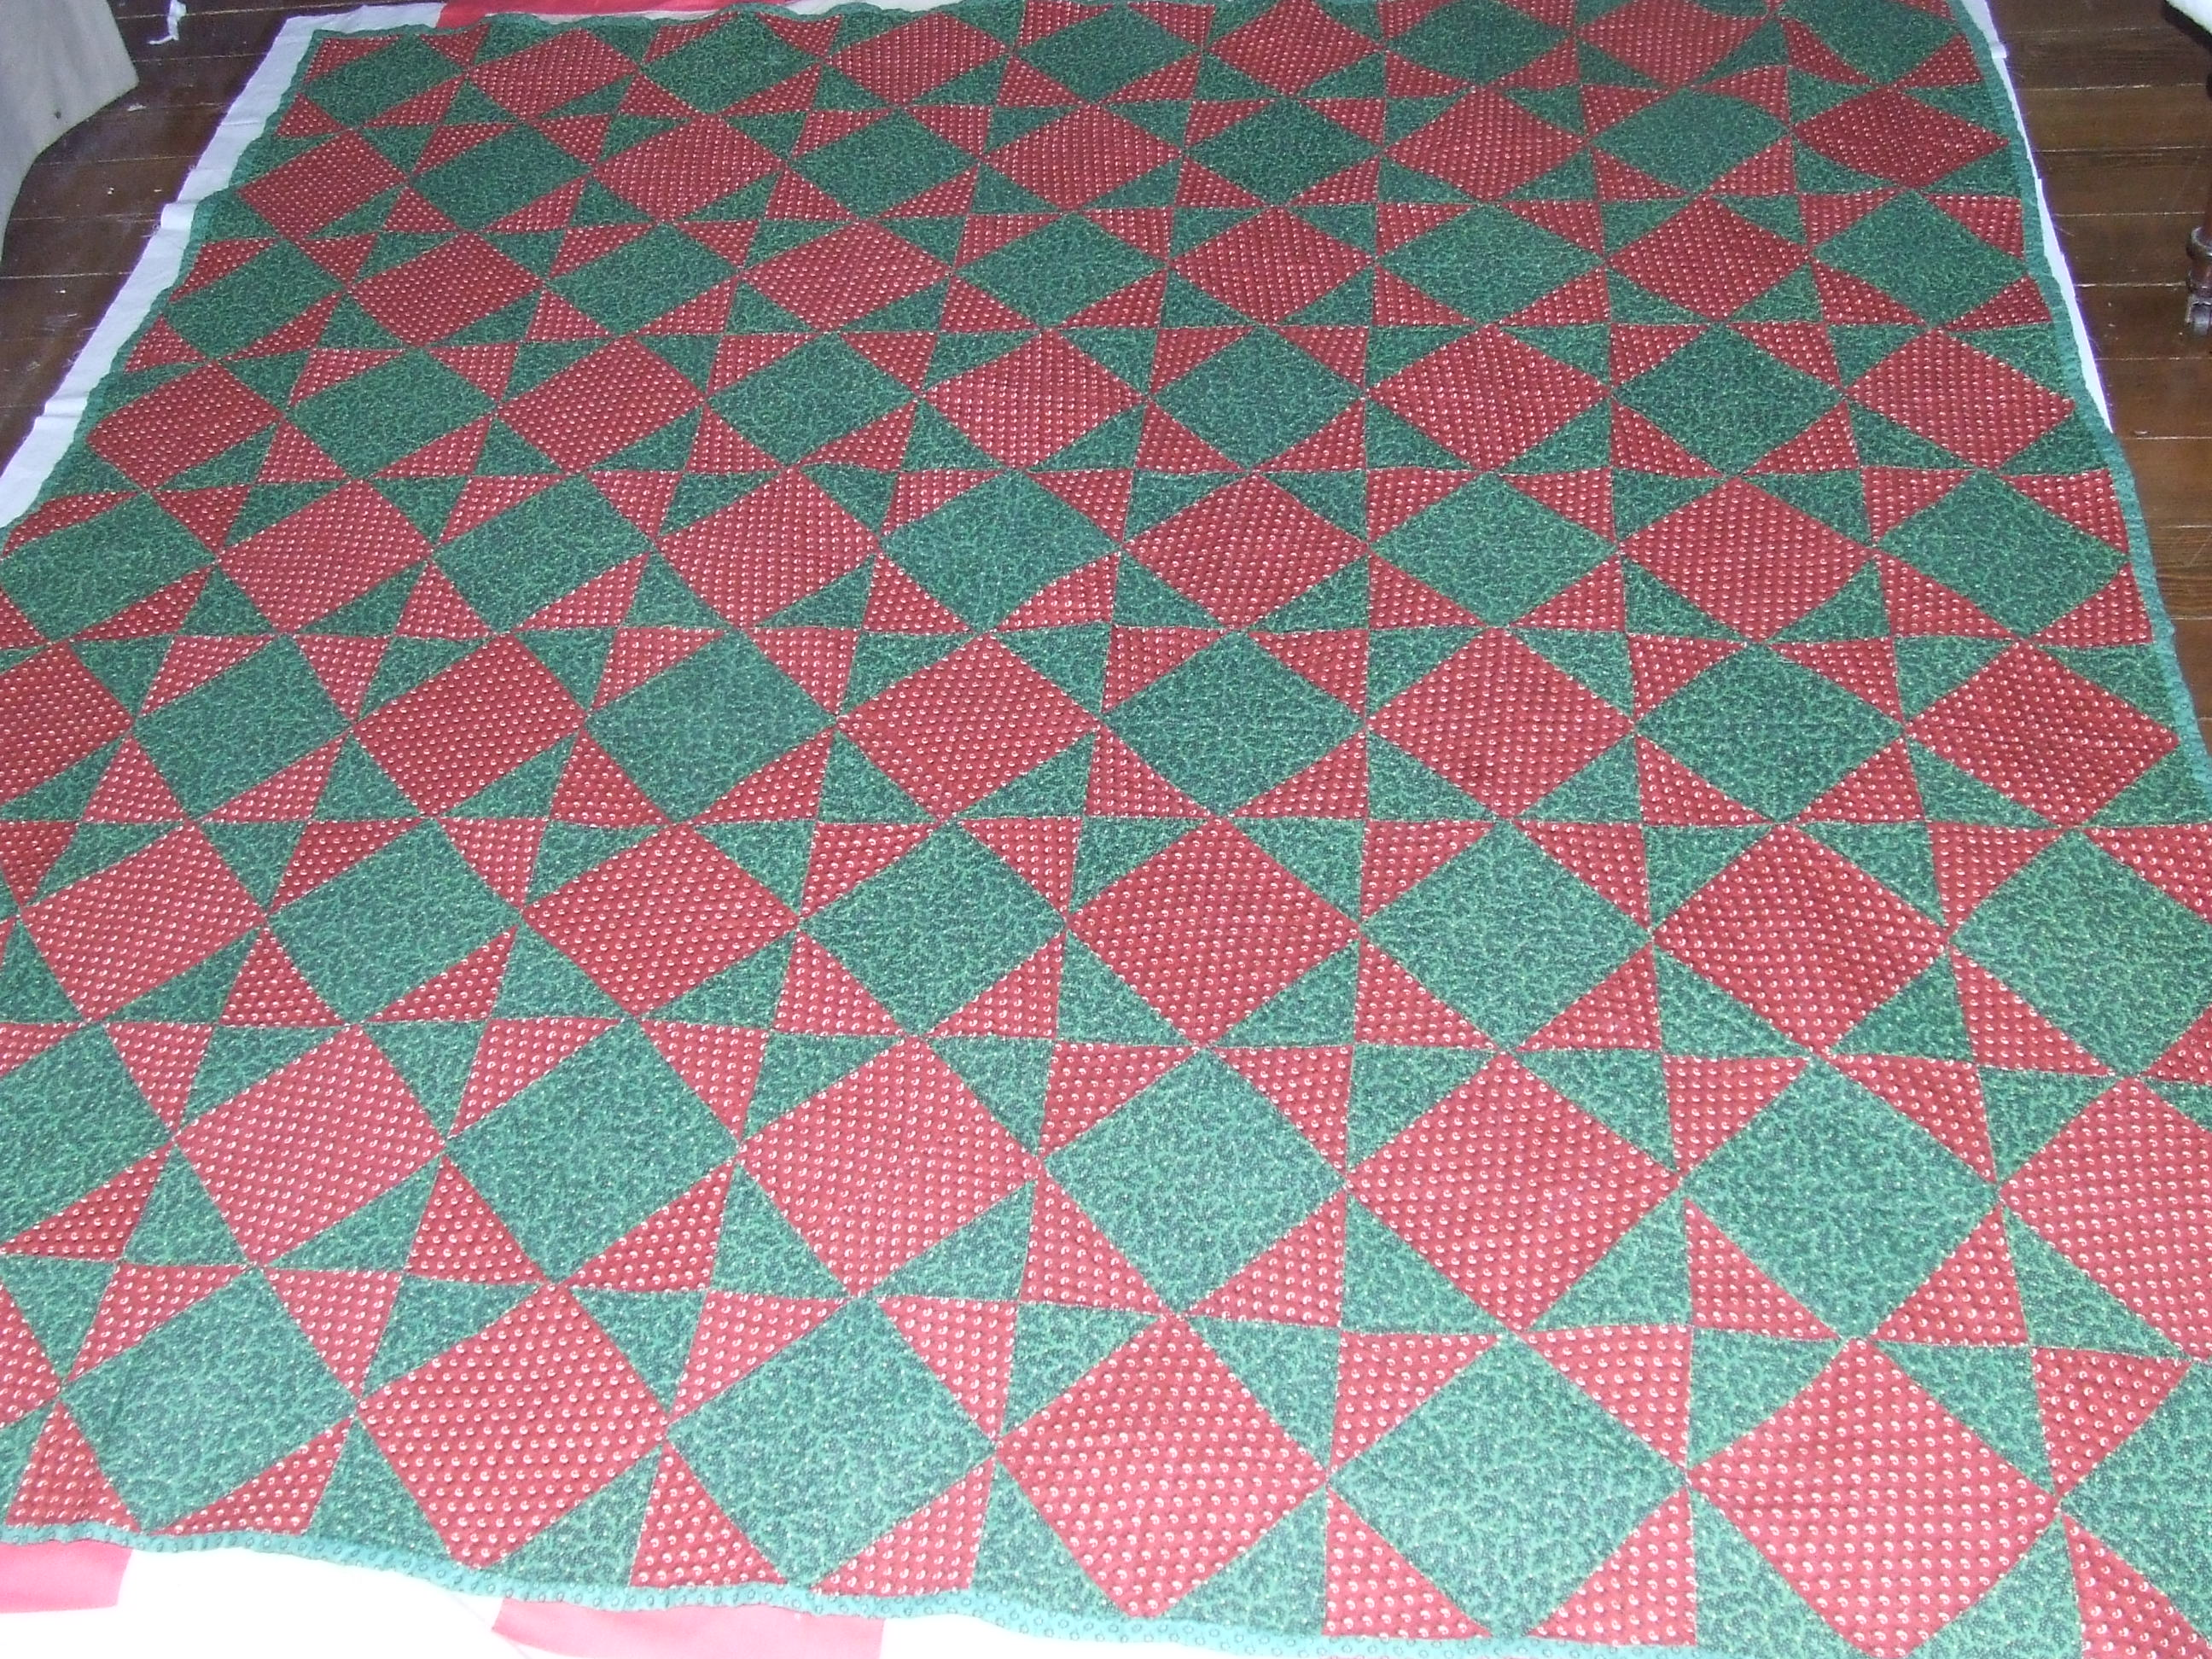 Applique designs for tablecloth - I Have An Applique